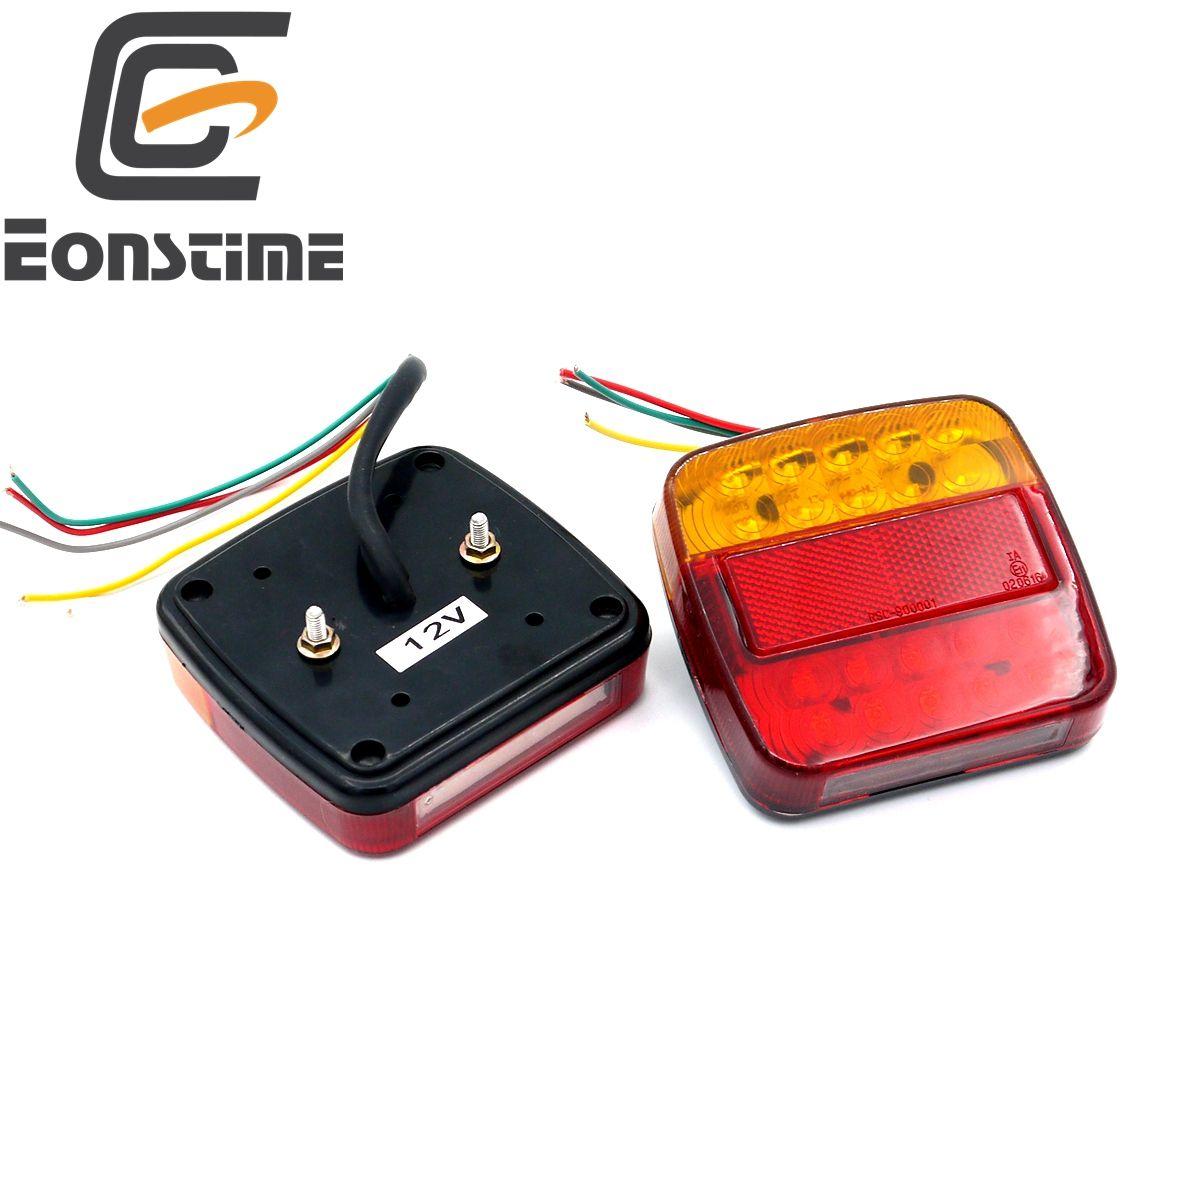 Eonstime 2pcs 12V  Trailer Truck 20 LED Taillight Tail Light Rear Lamps Turn Signal Brake 6 LED Number Plate Light Lamp